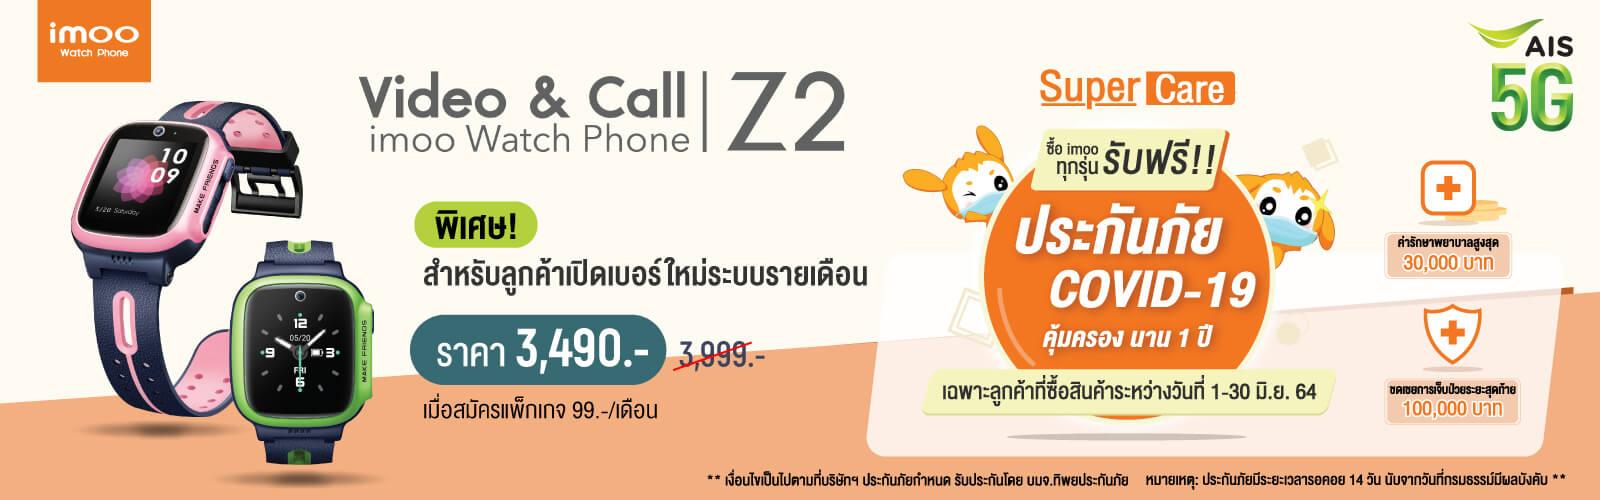 imoo Watch Phone รุ่น Z2